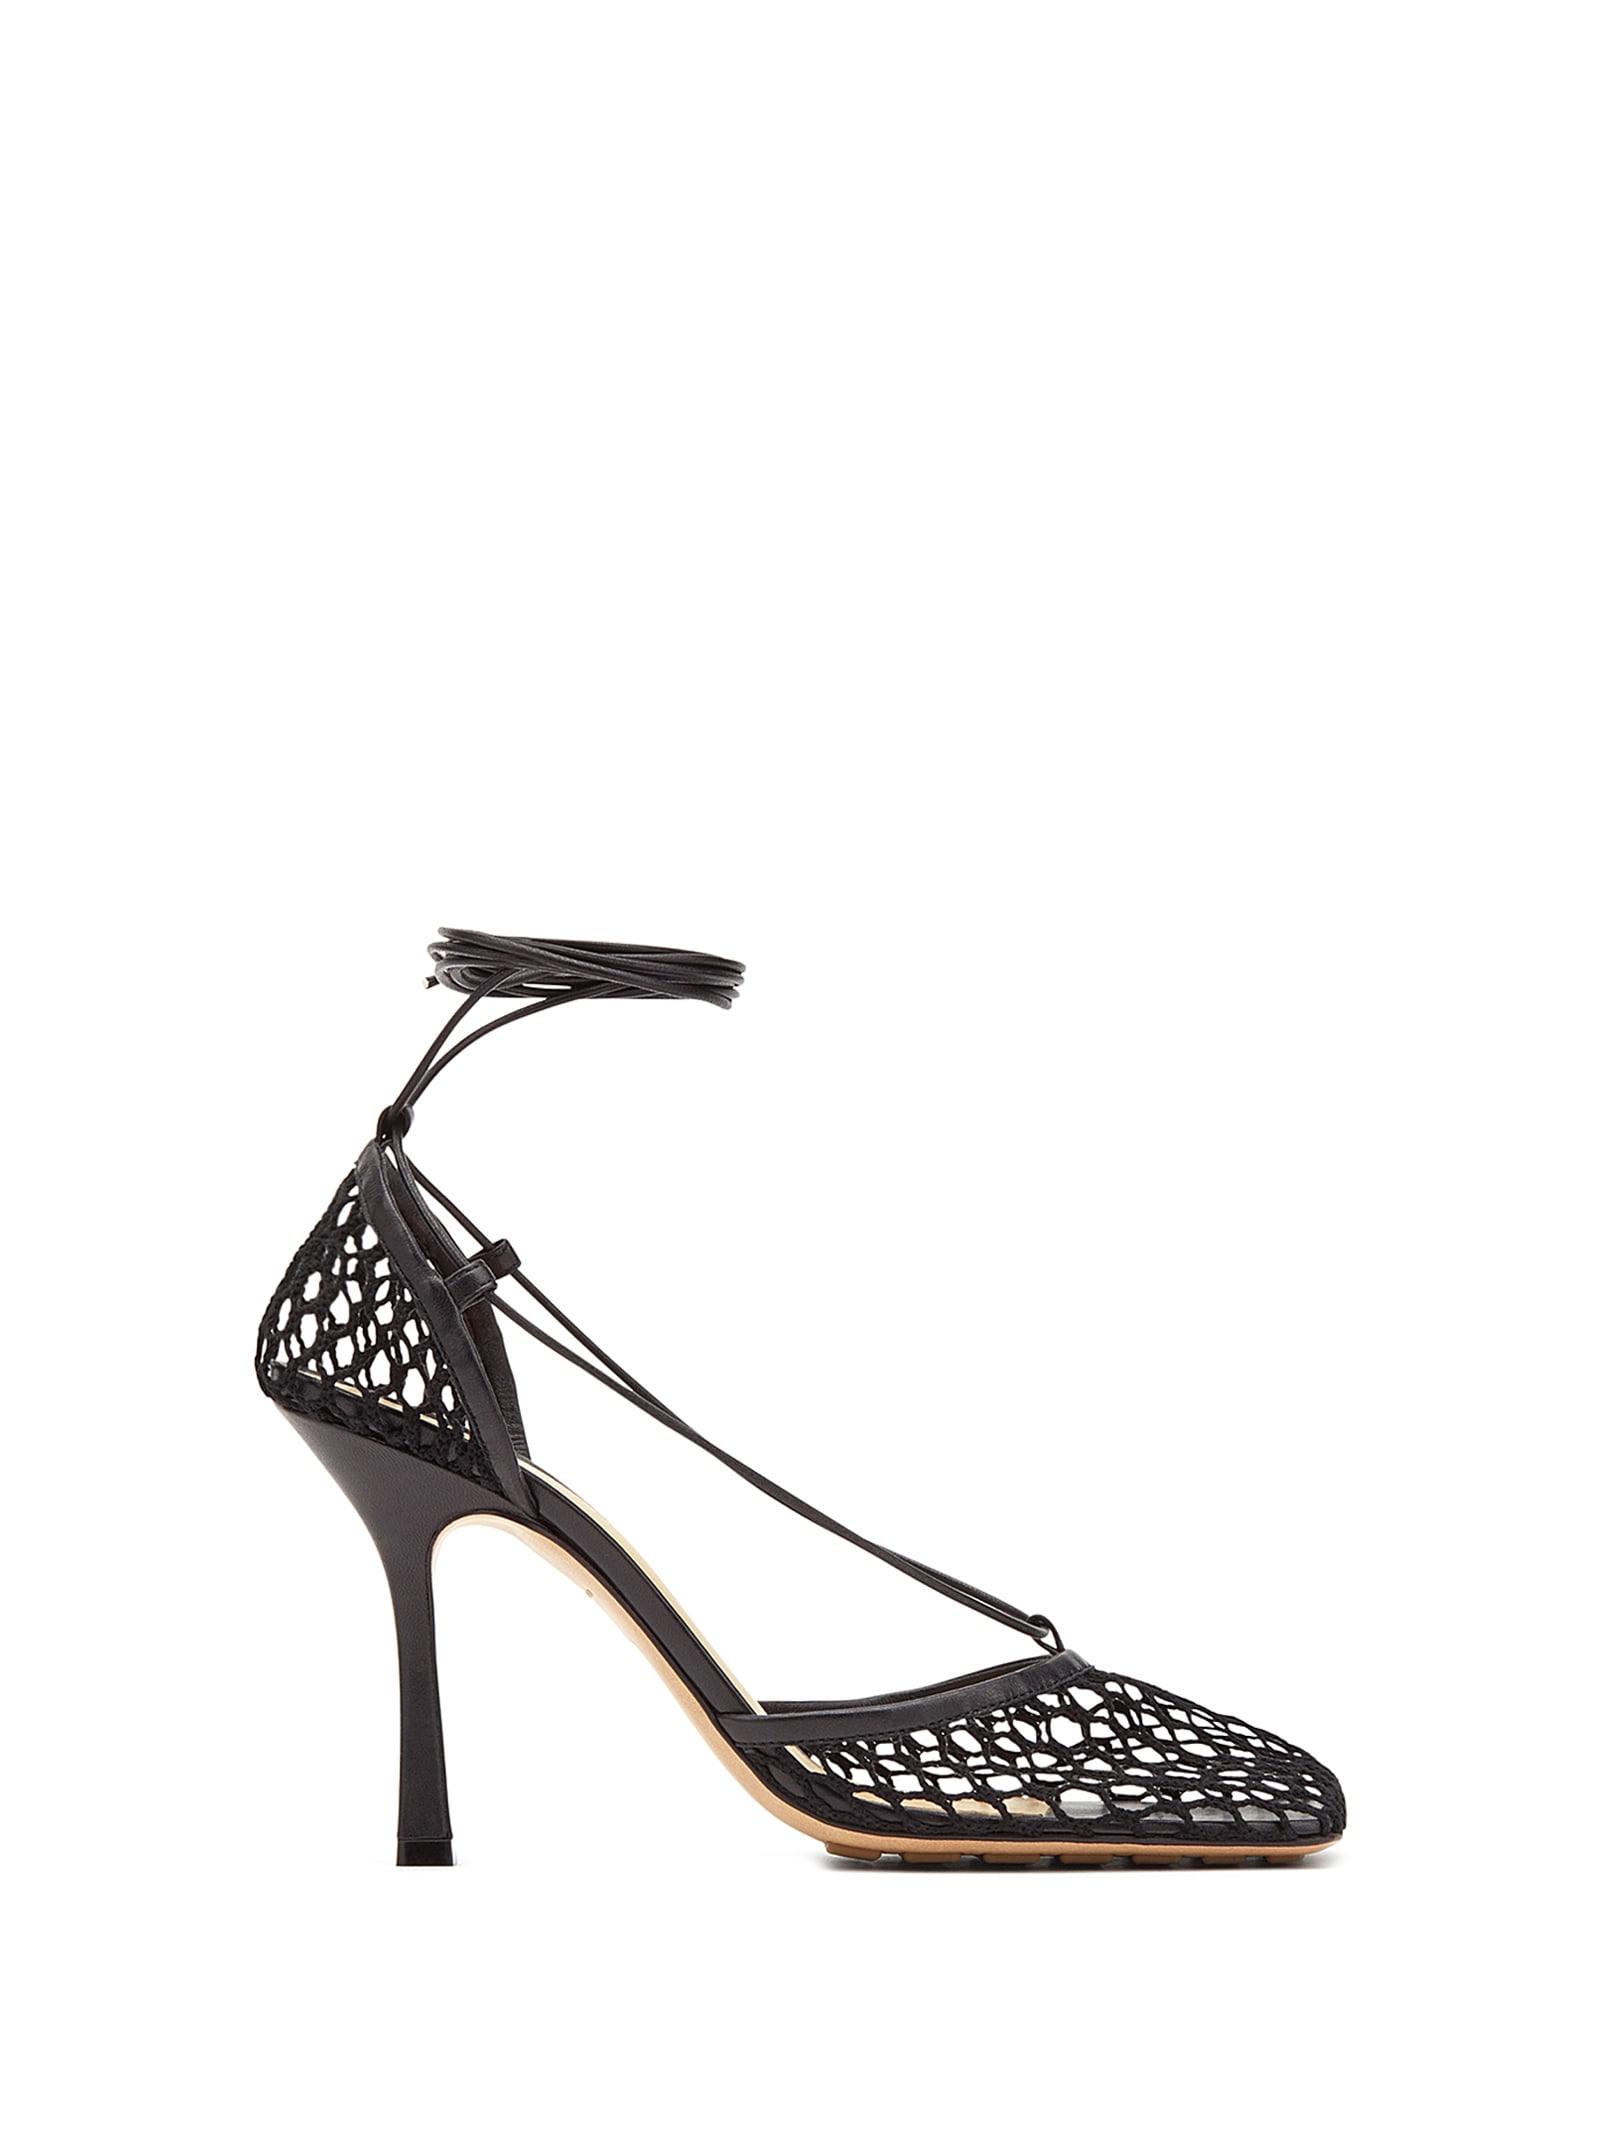 Buy Bottega Veneta Mesh Pumps online, shop Bottega Veneta shoes with free shipping